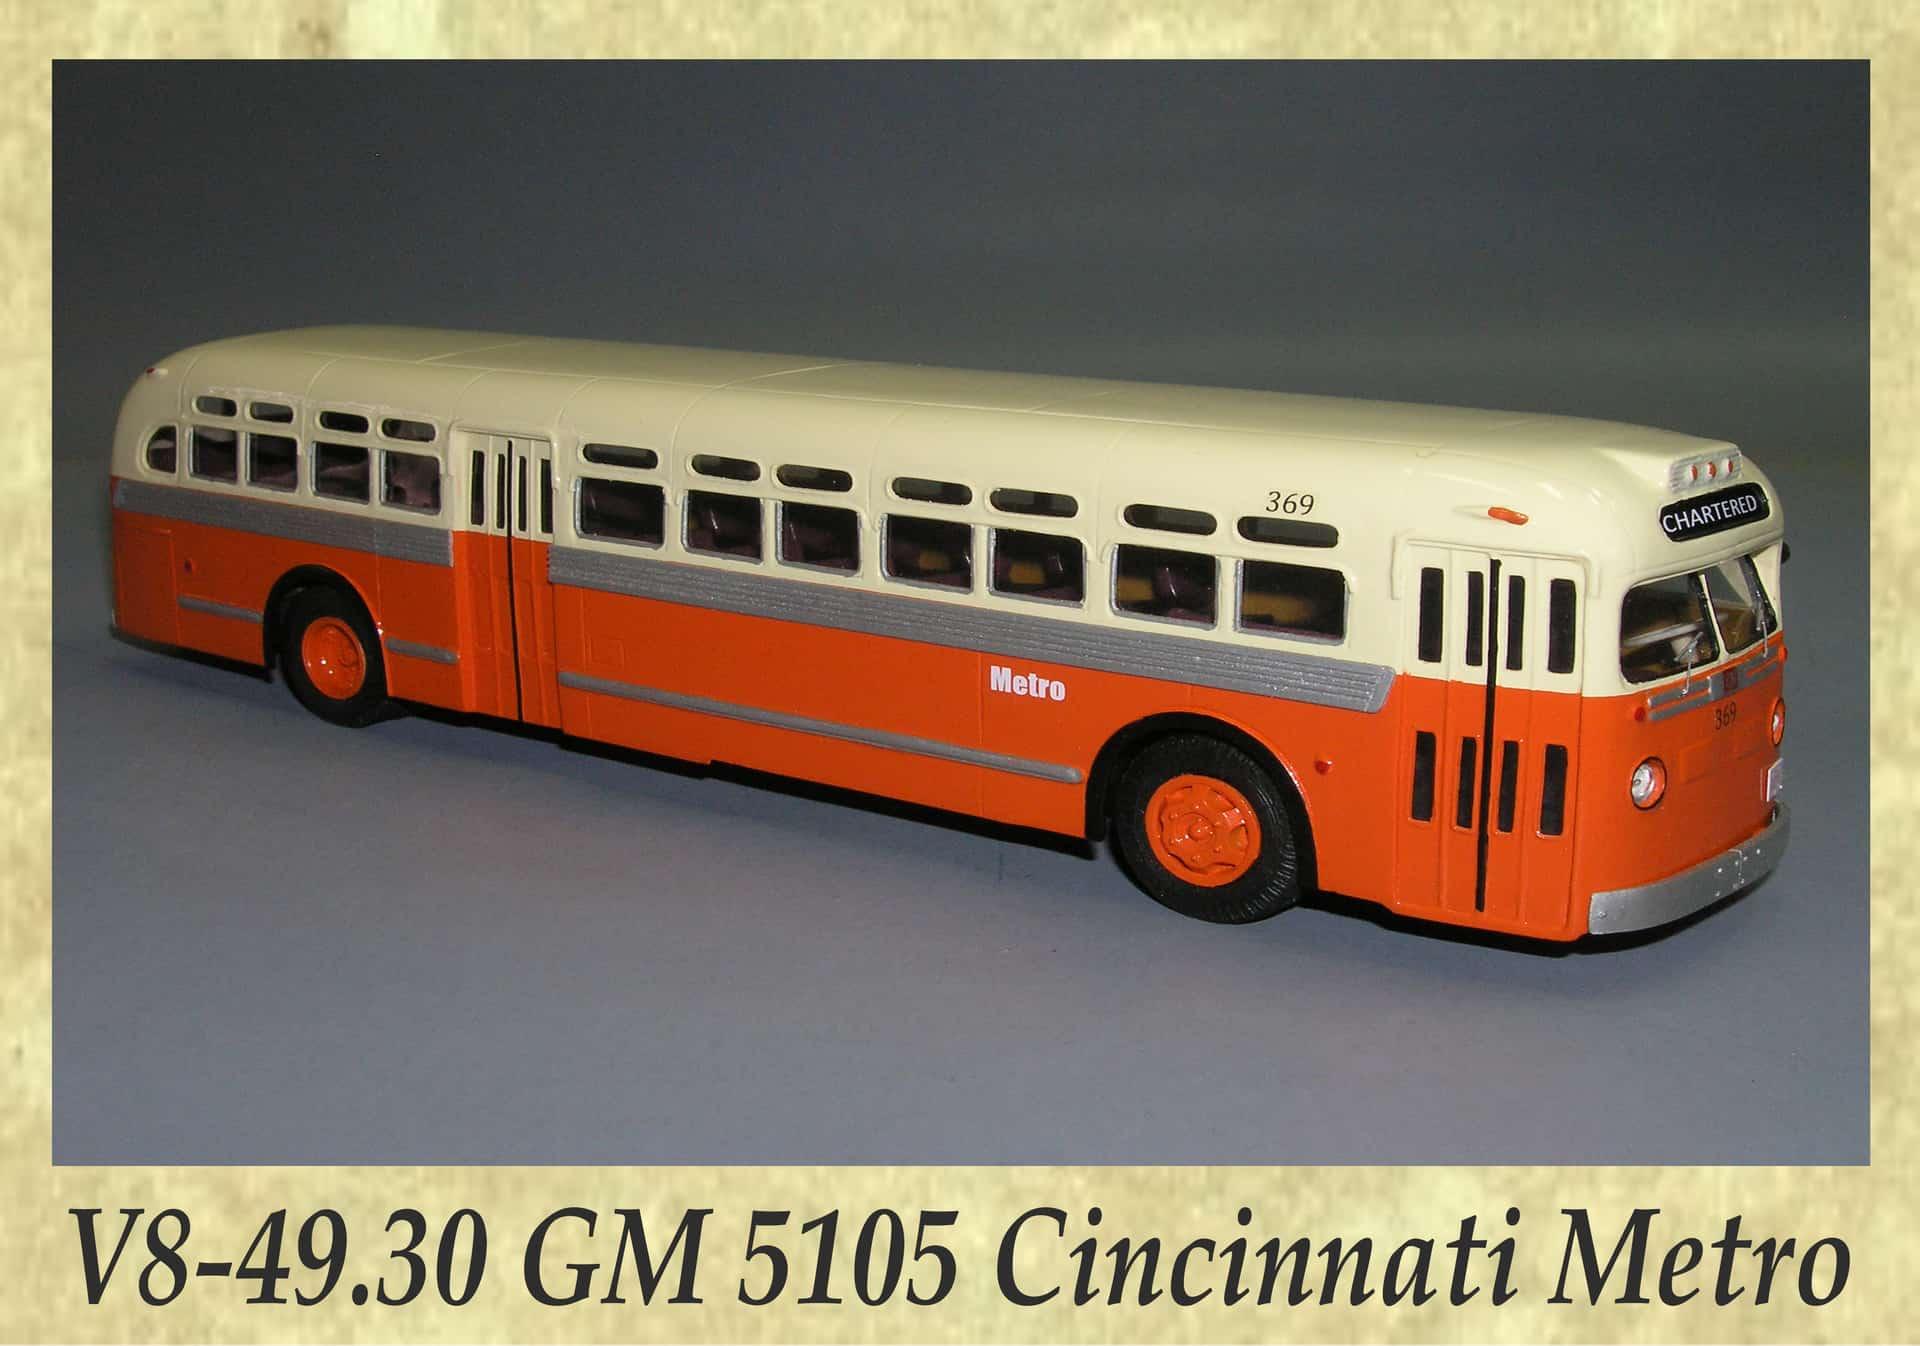 V8-49.30 GM 5105 Cincinnati Metro